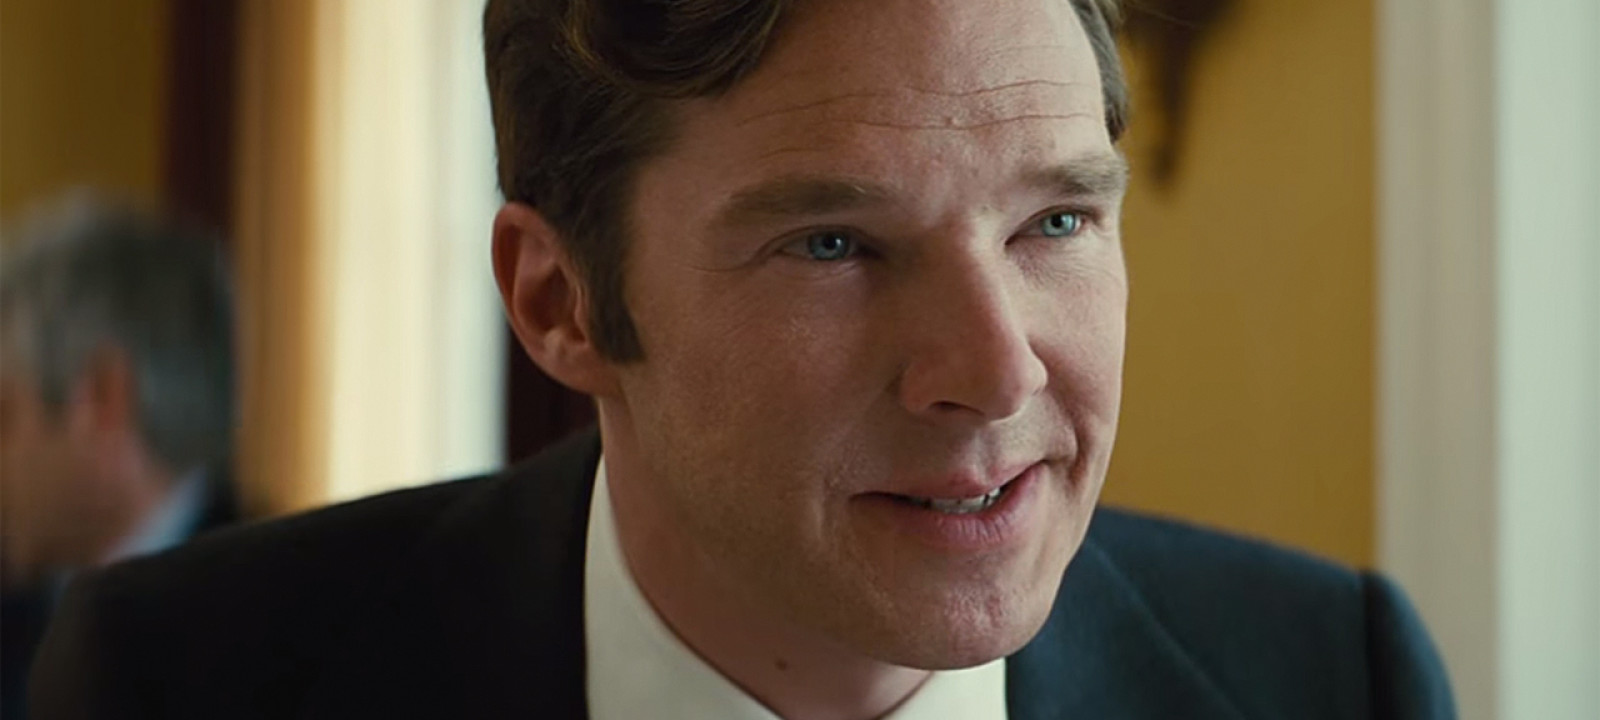 WATCH: Benedict Cumberbatch in 'Black Mass' Trailer